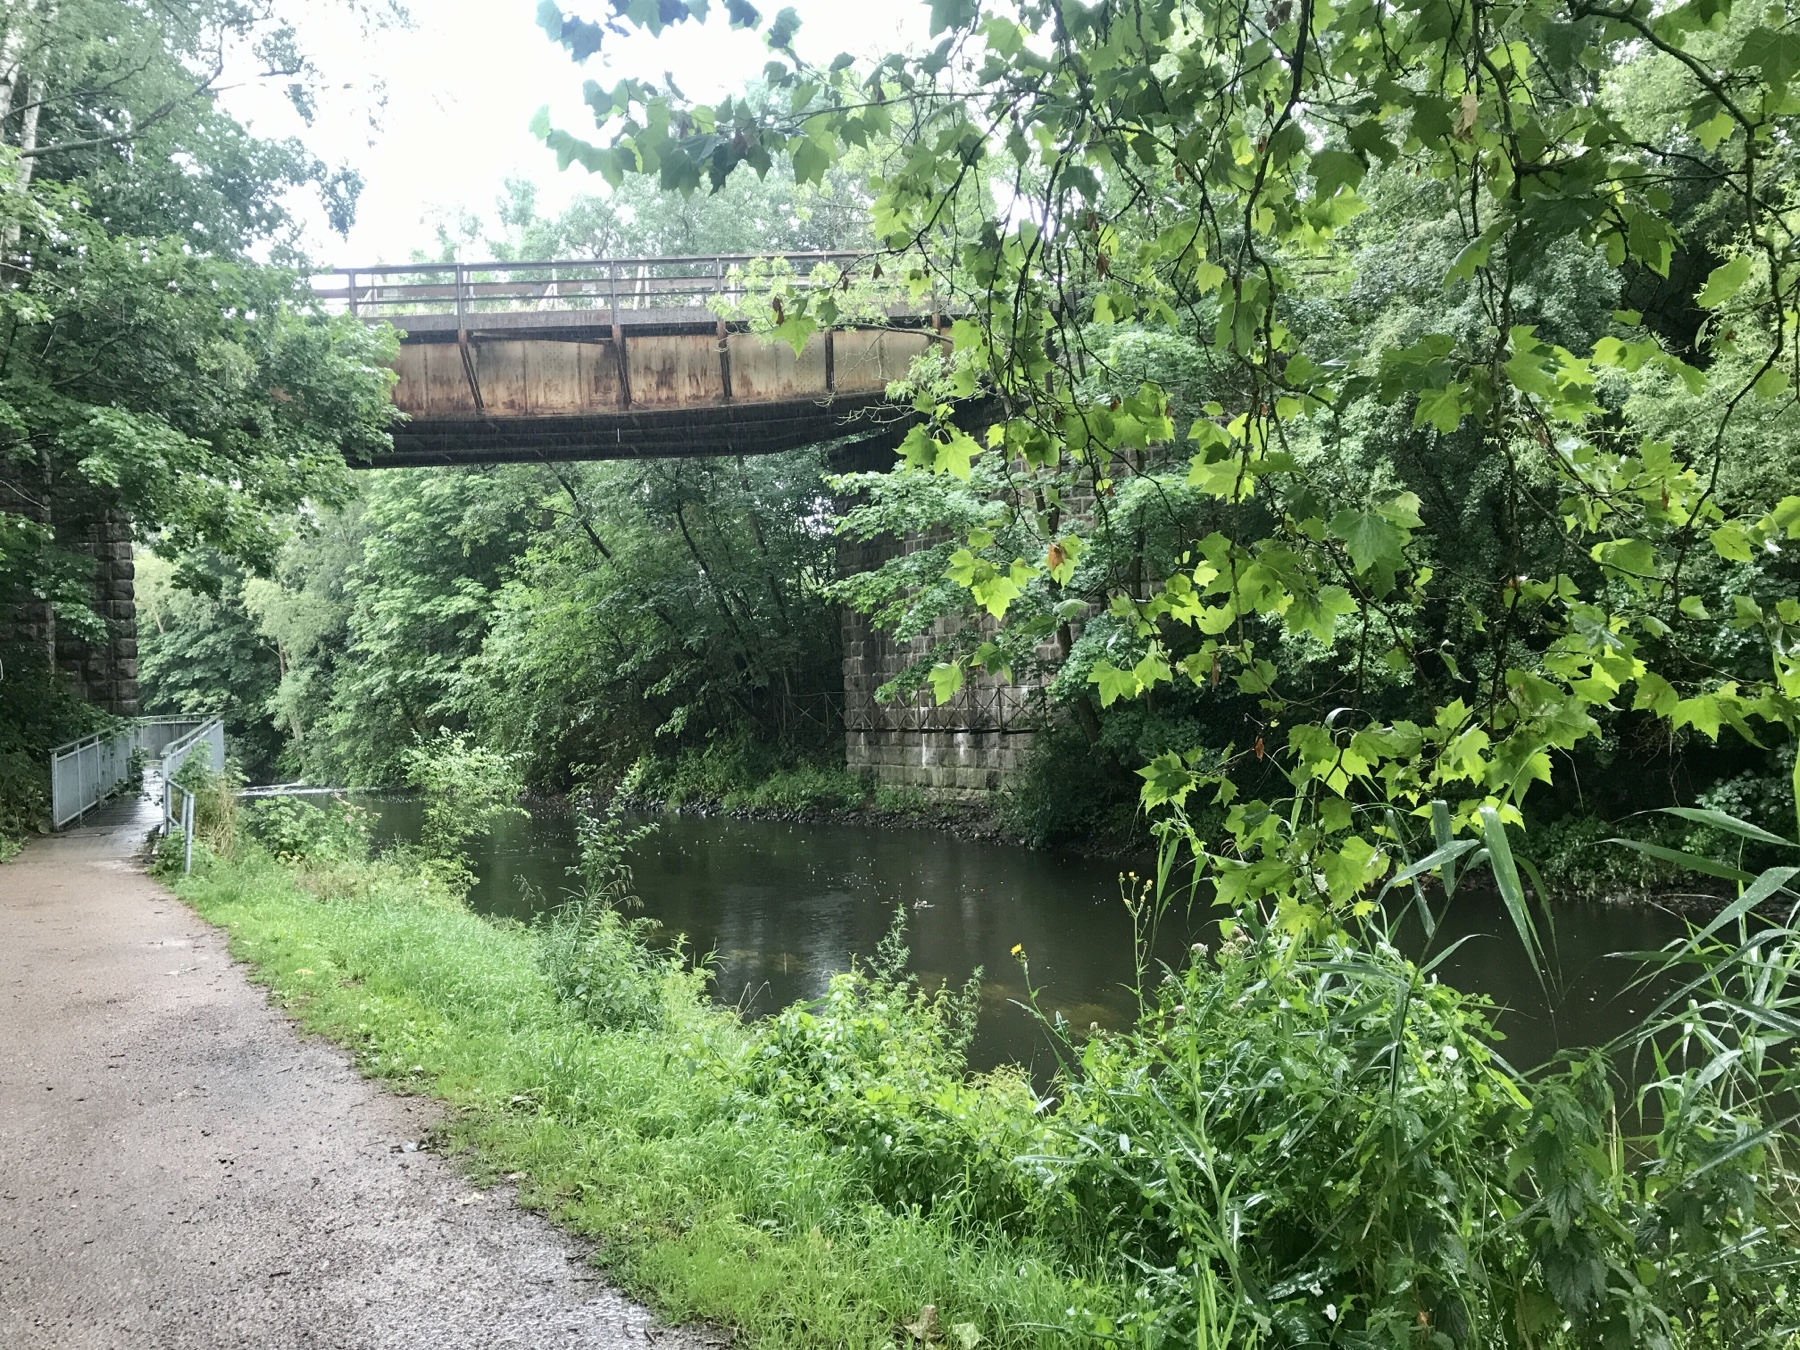 Eisenbahnbrücke Stormarnweg Bad Oldesloe nach Reinfeld